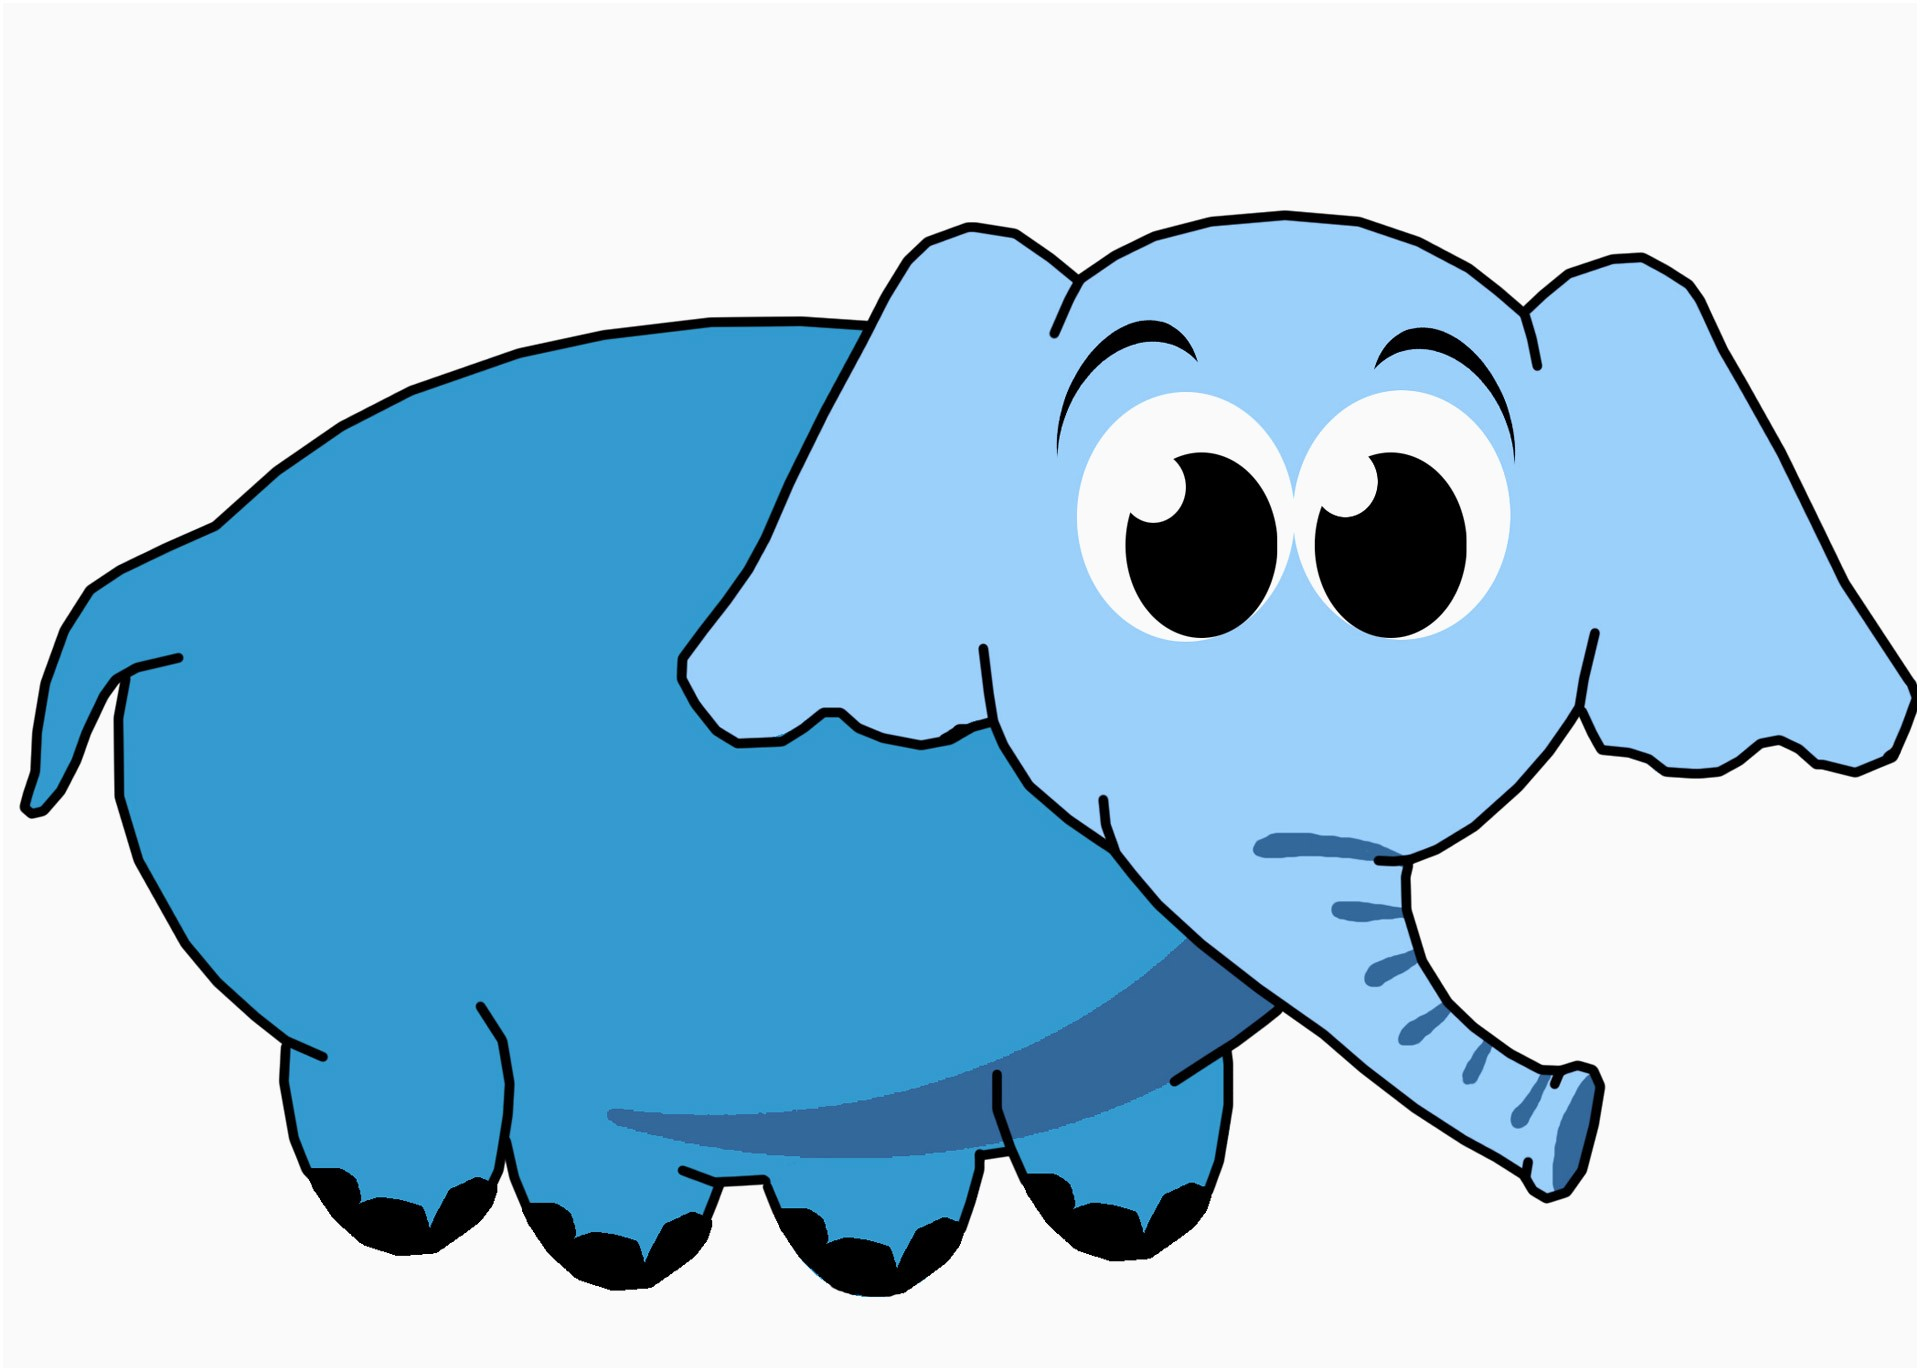 1920x1371 Elephant Clipart Fresh Cute Baby Elephant Cartoon Stock Image